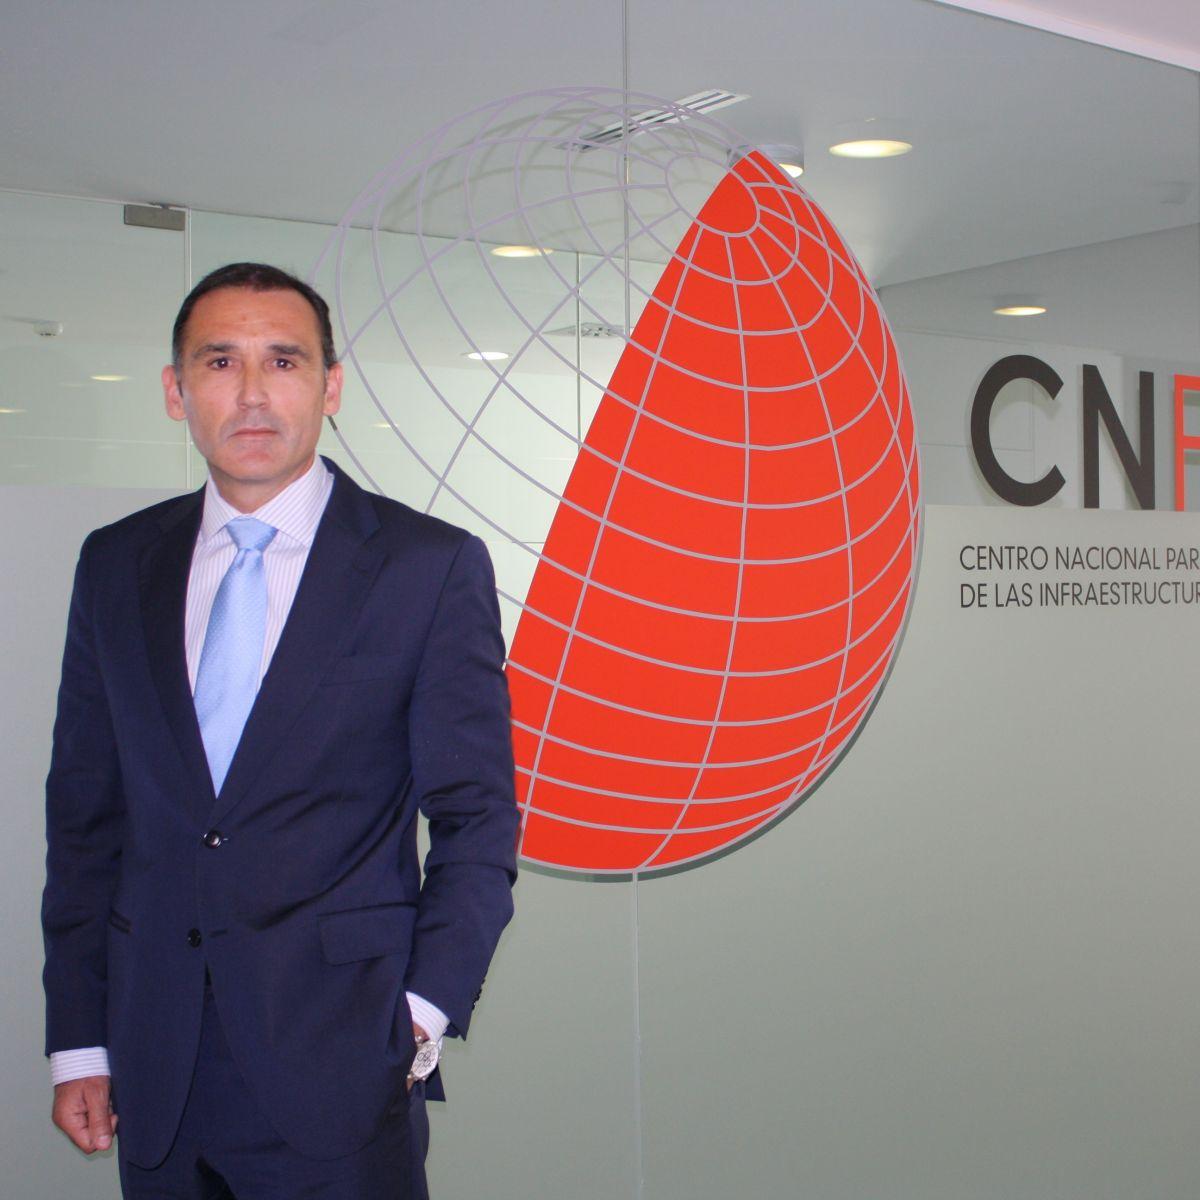 fernando_sanchez_cnpic.jpg